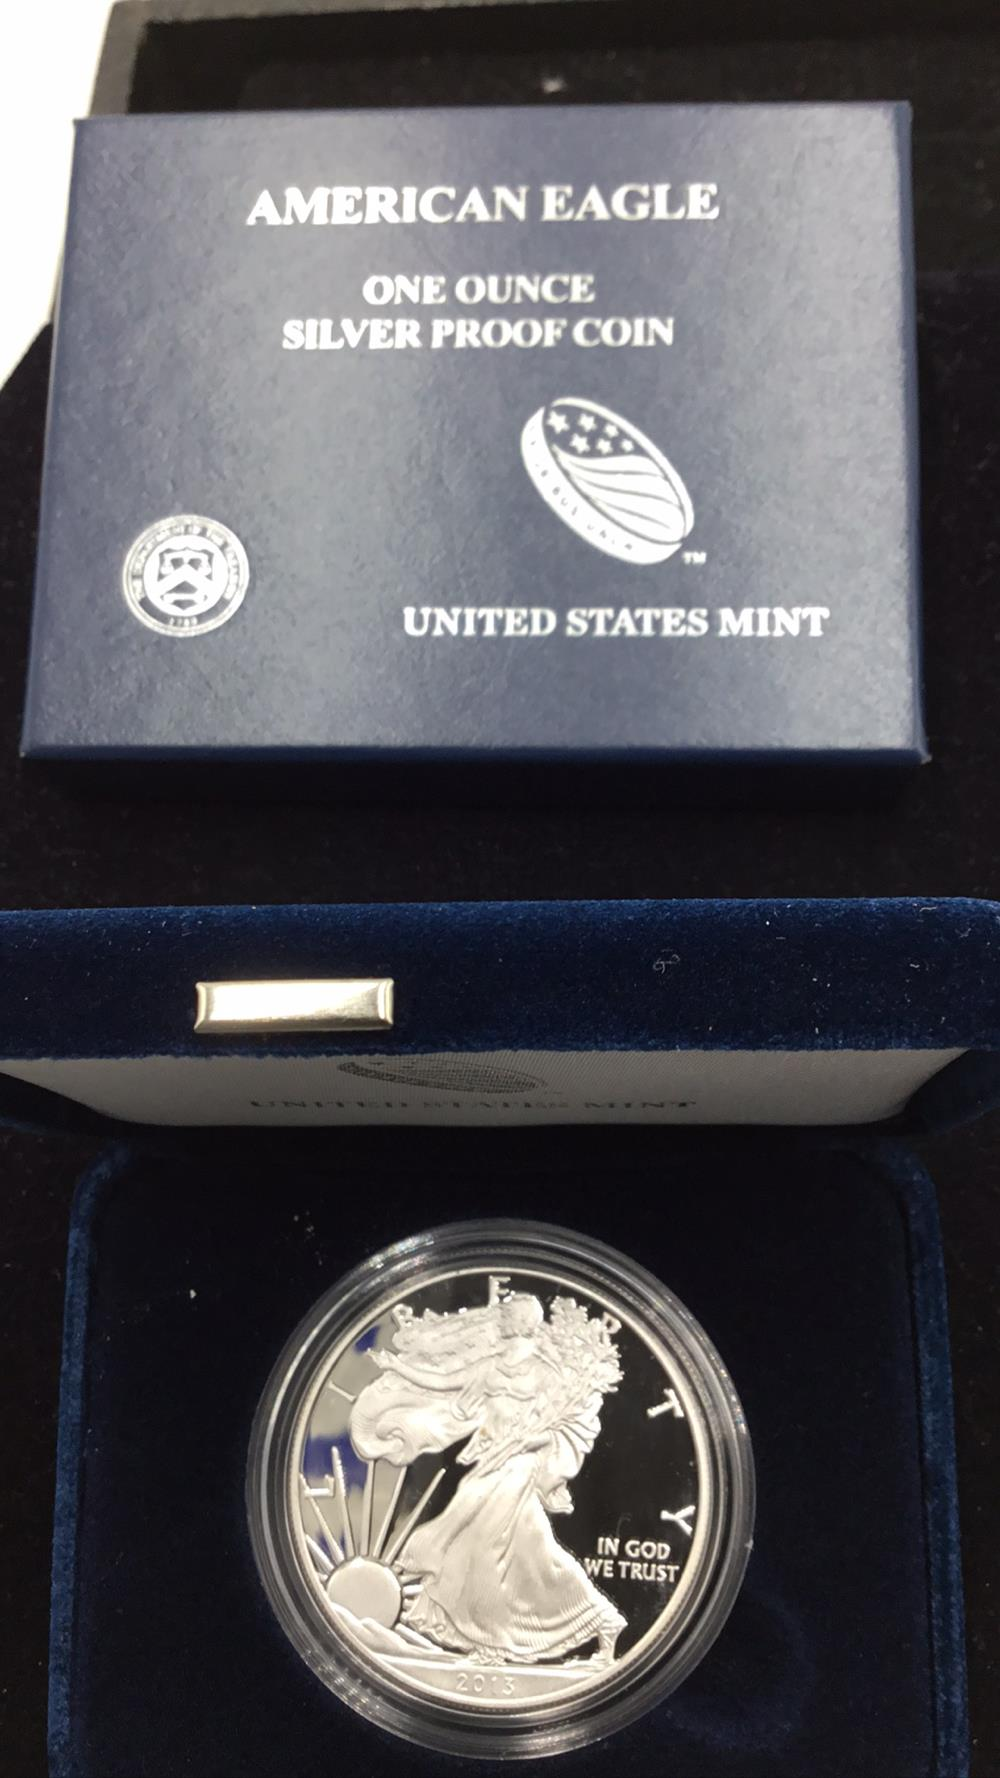 Lot 110: United states I mint American eagle 1 ounce